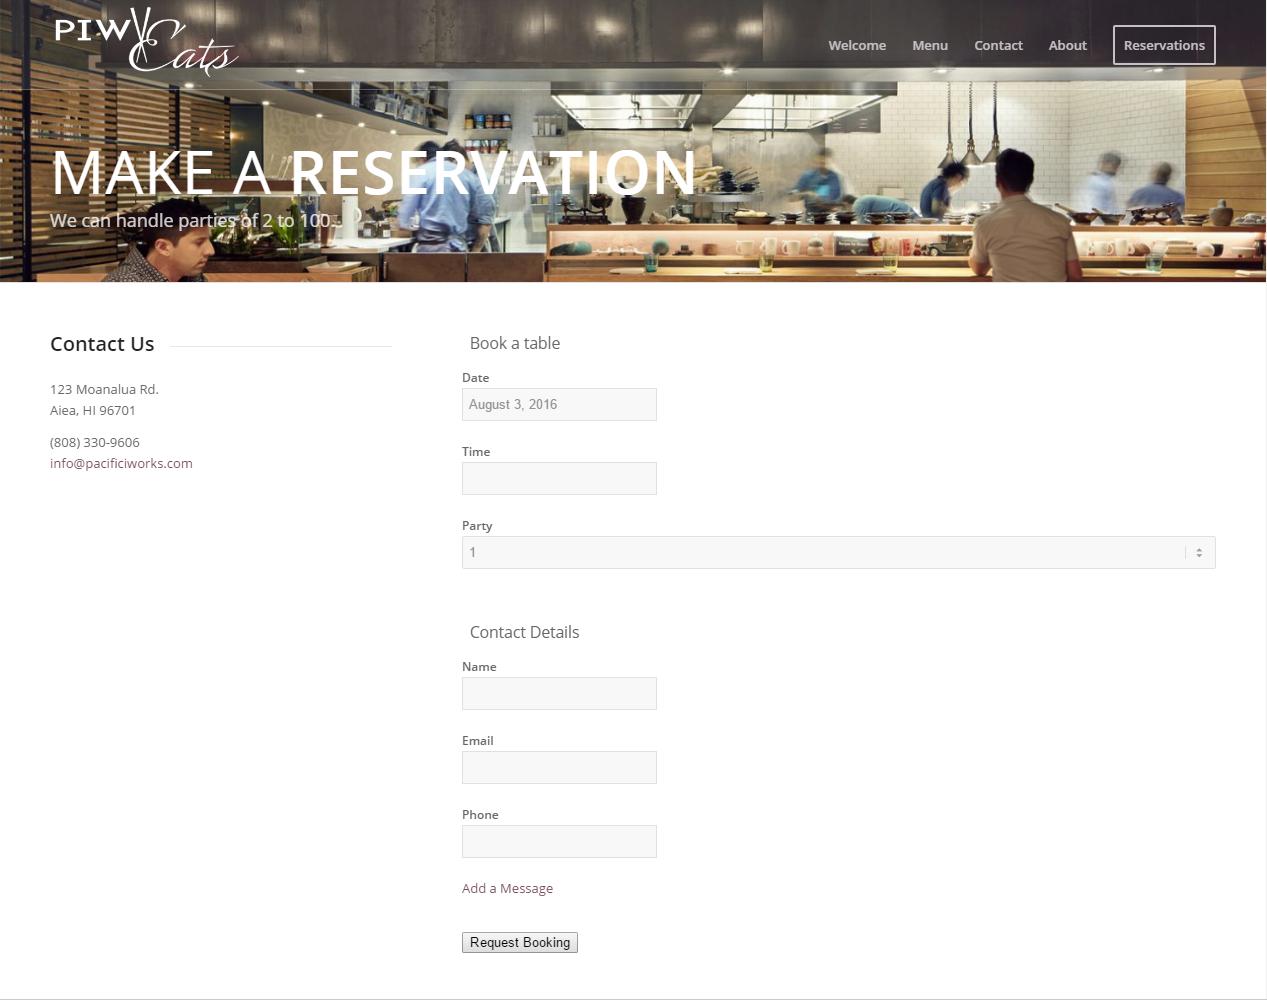 Restaurant Web Site Demo